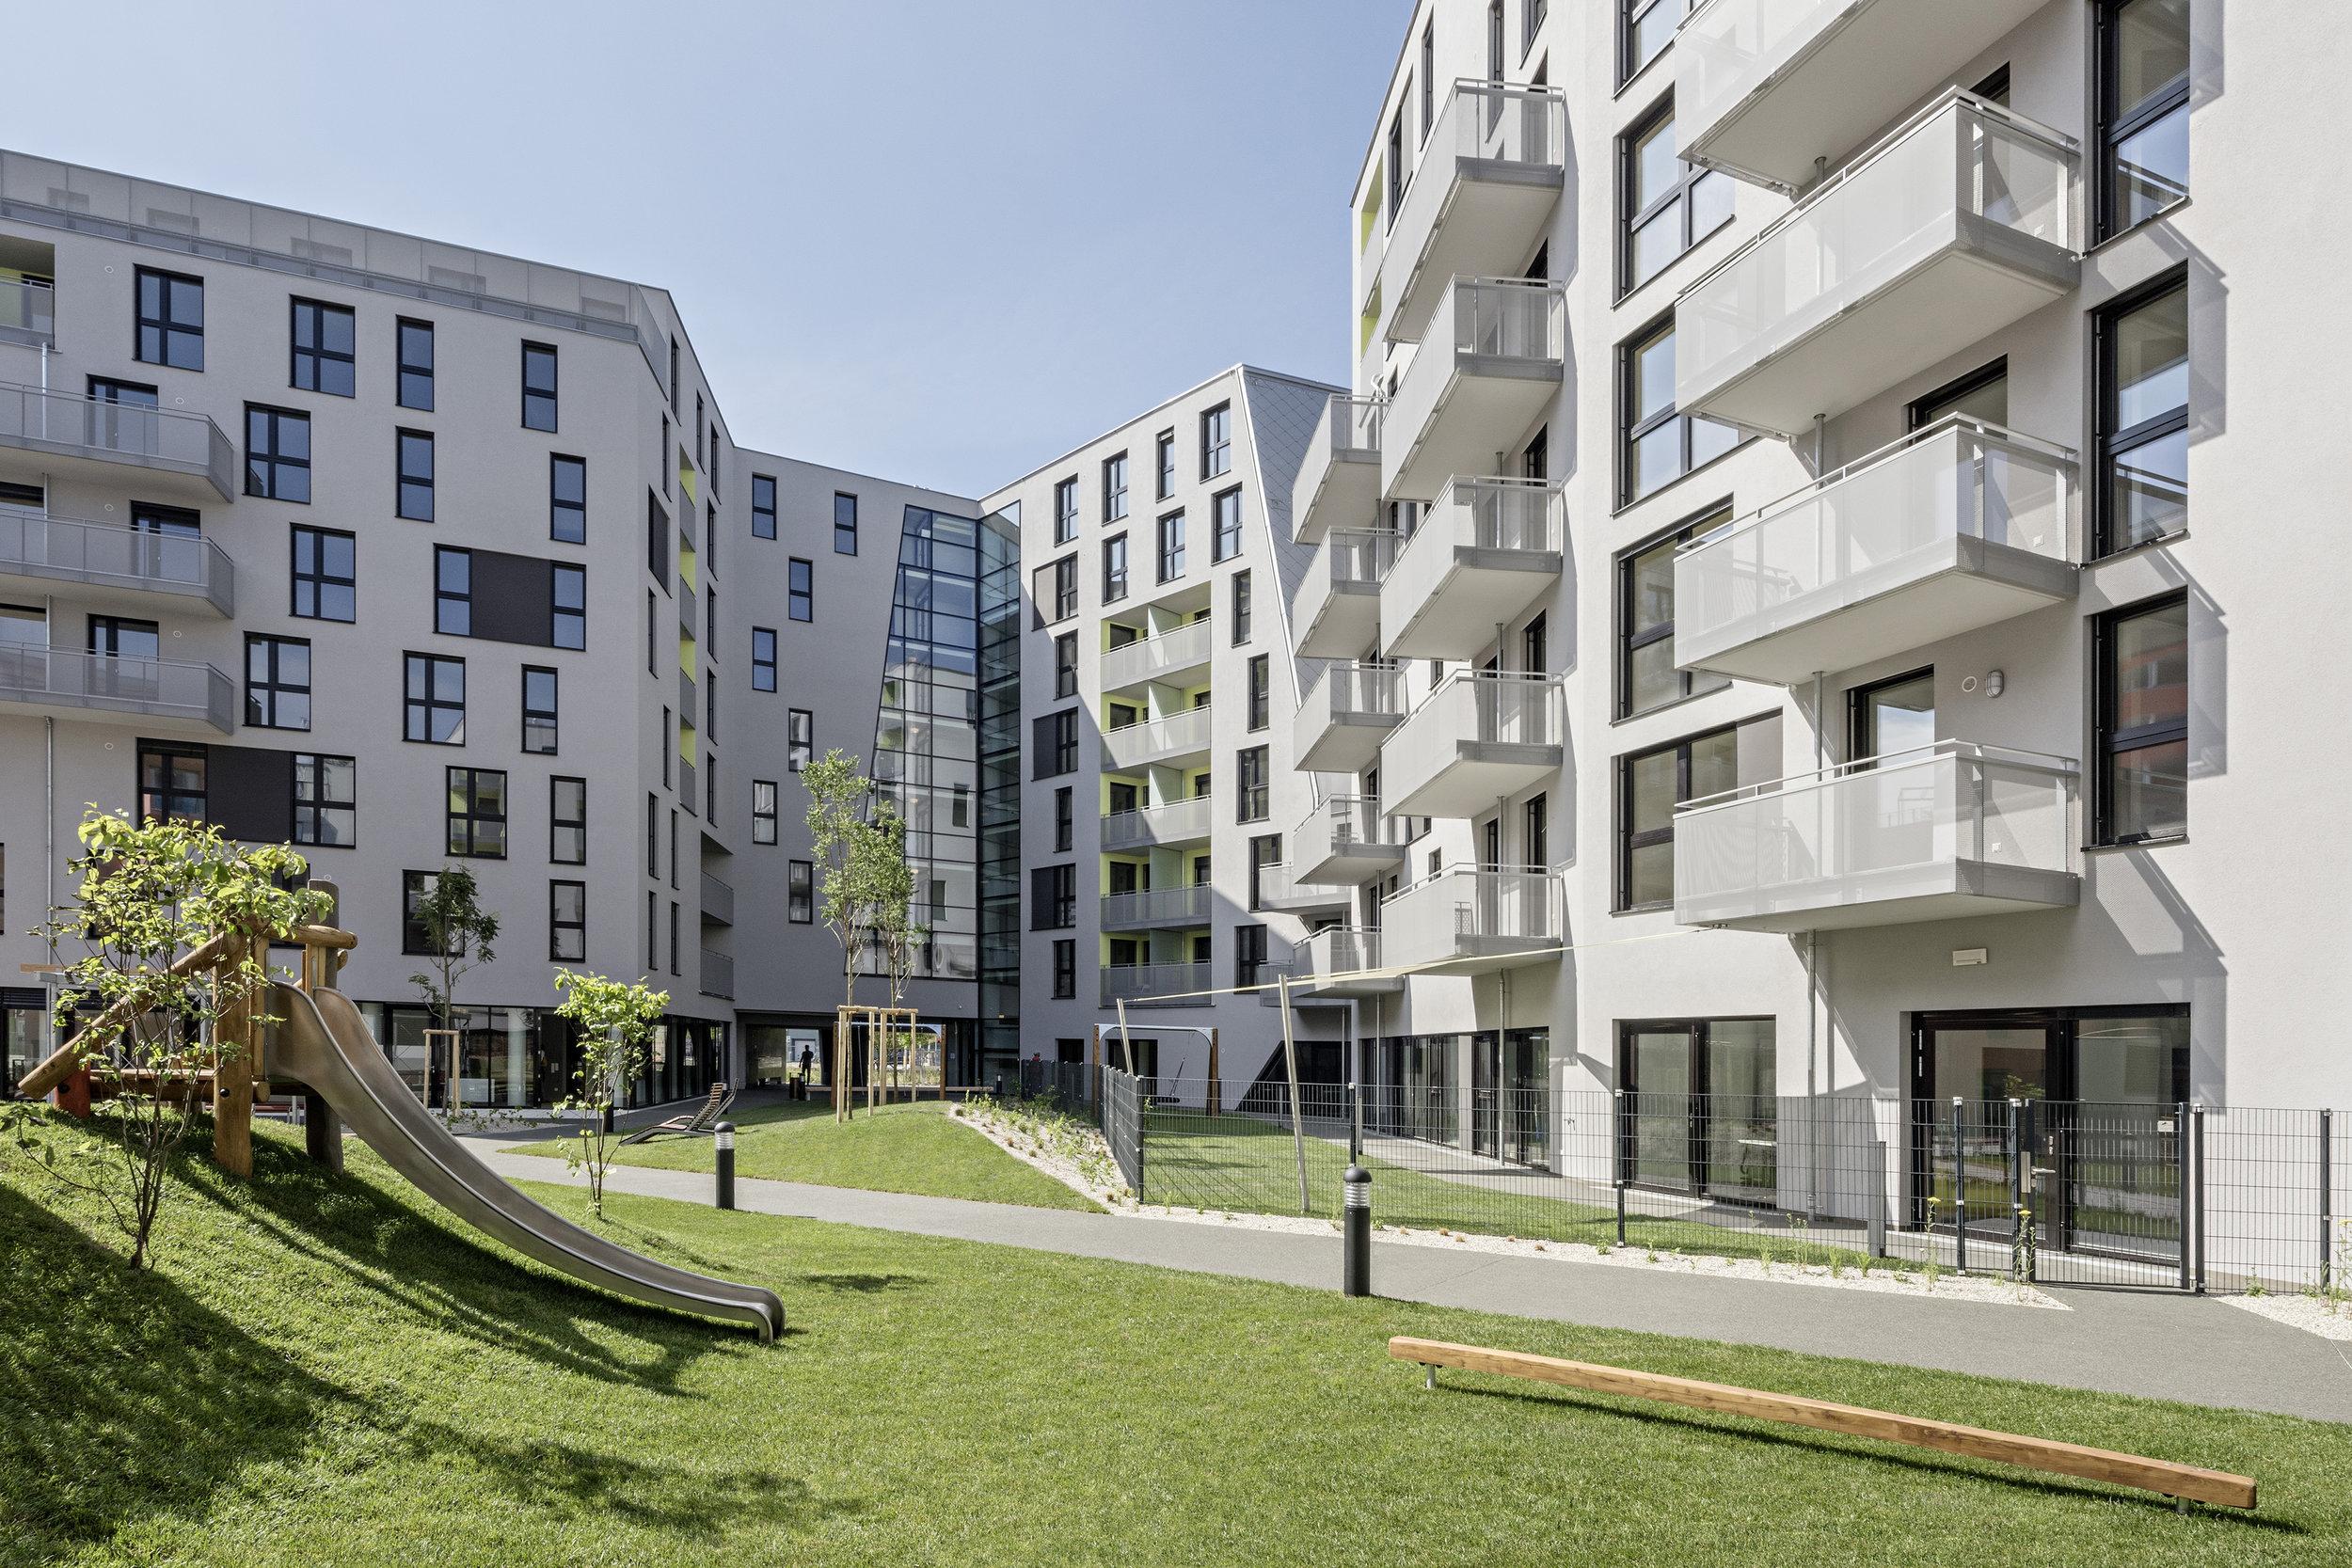 Sonnwendviertel - image credit: Hertha Hurnaus